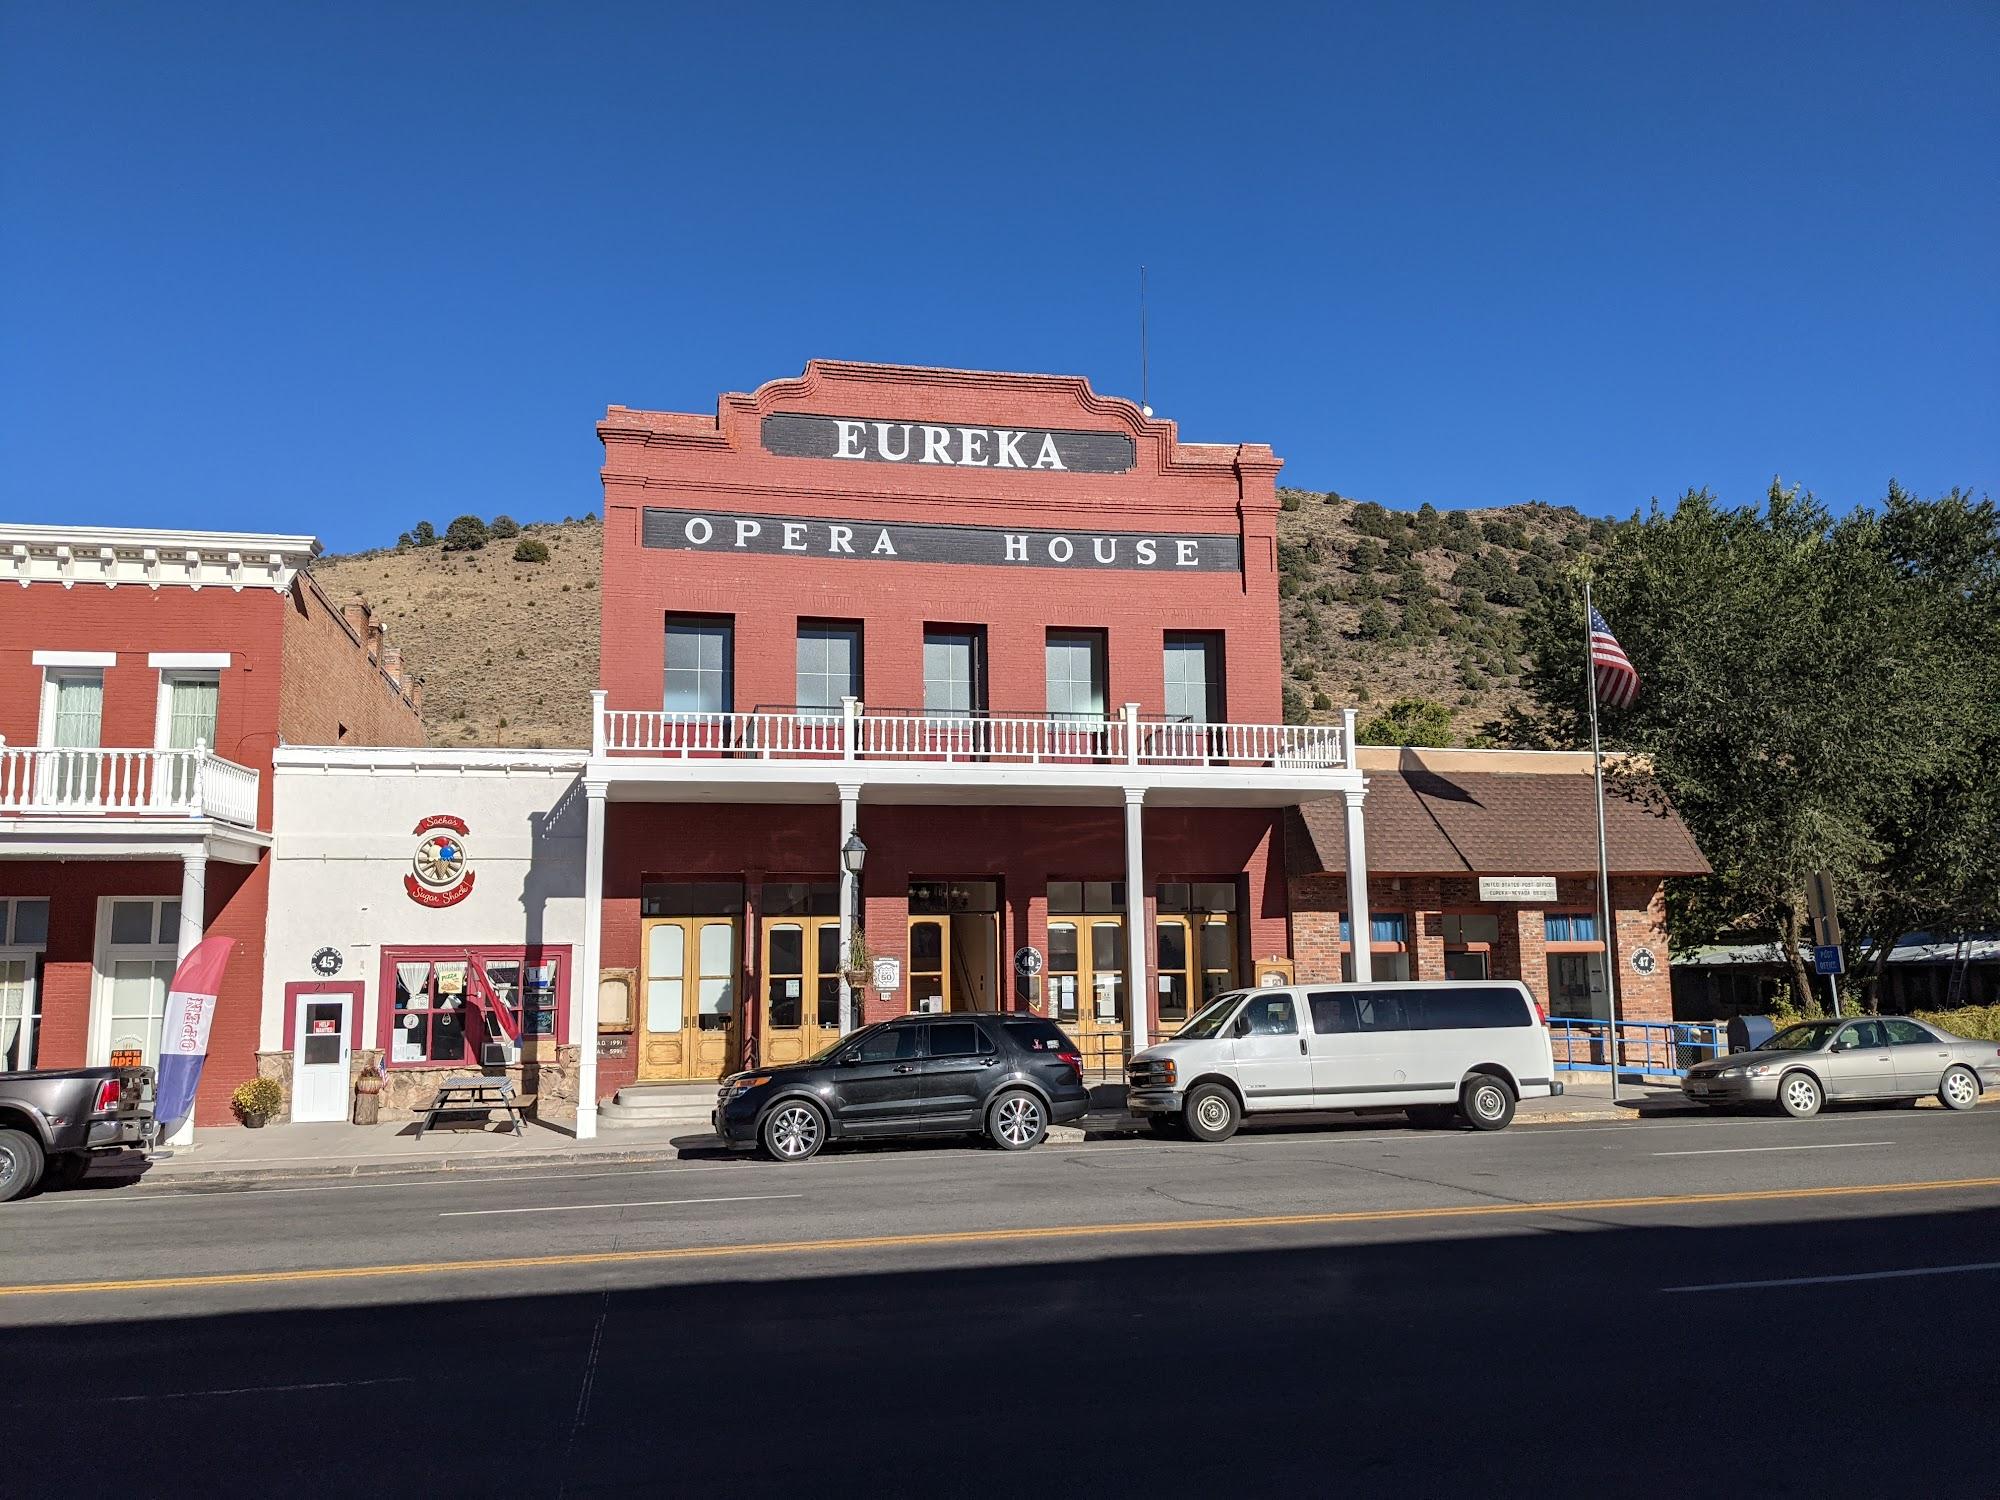 Eureka County Opera House 31 S Main St, Eureka